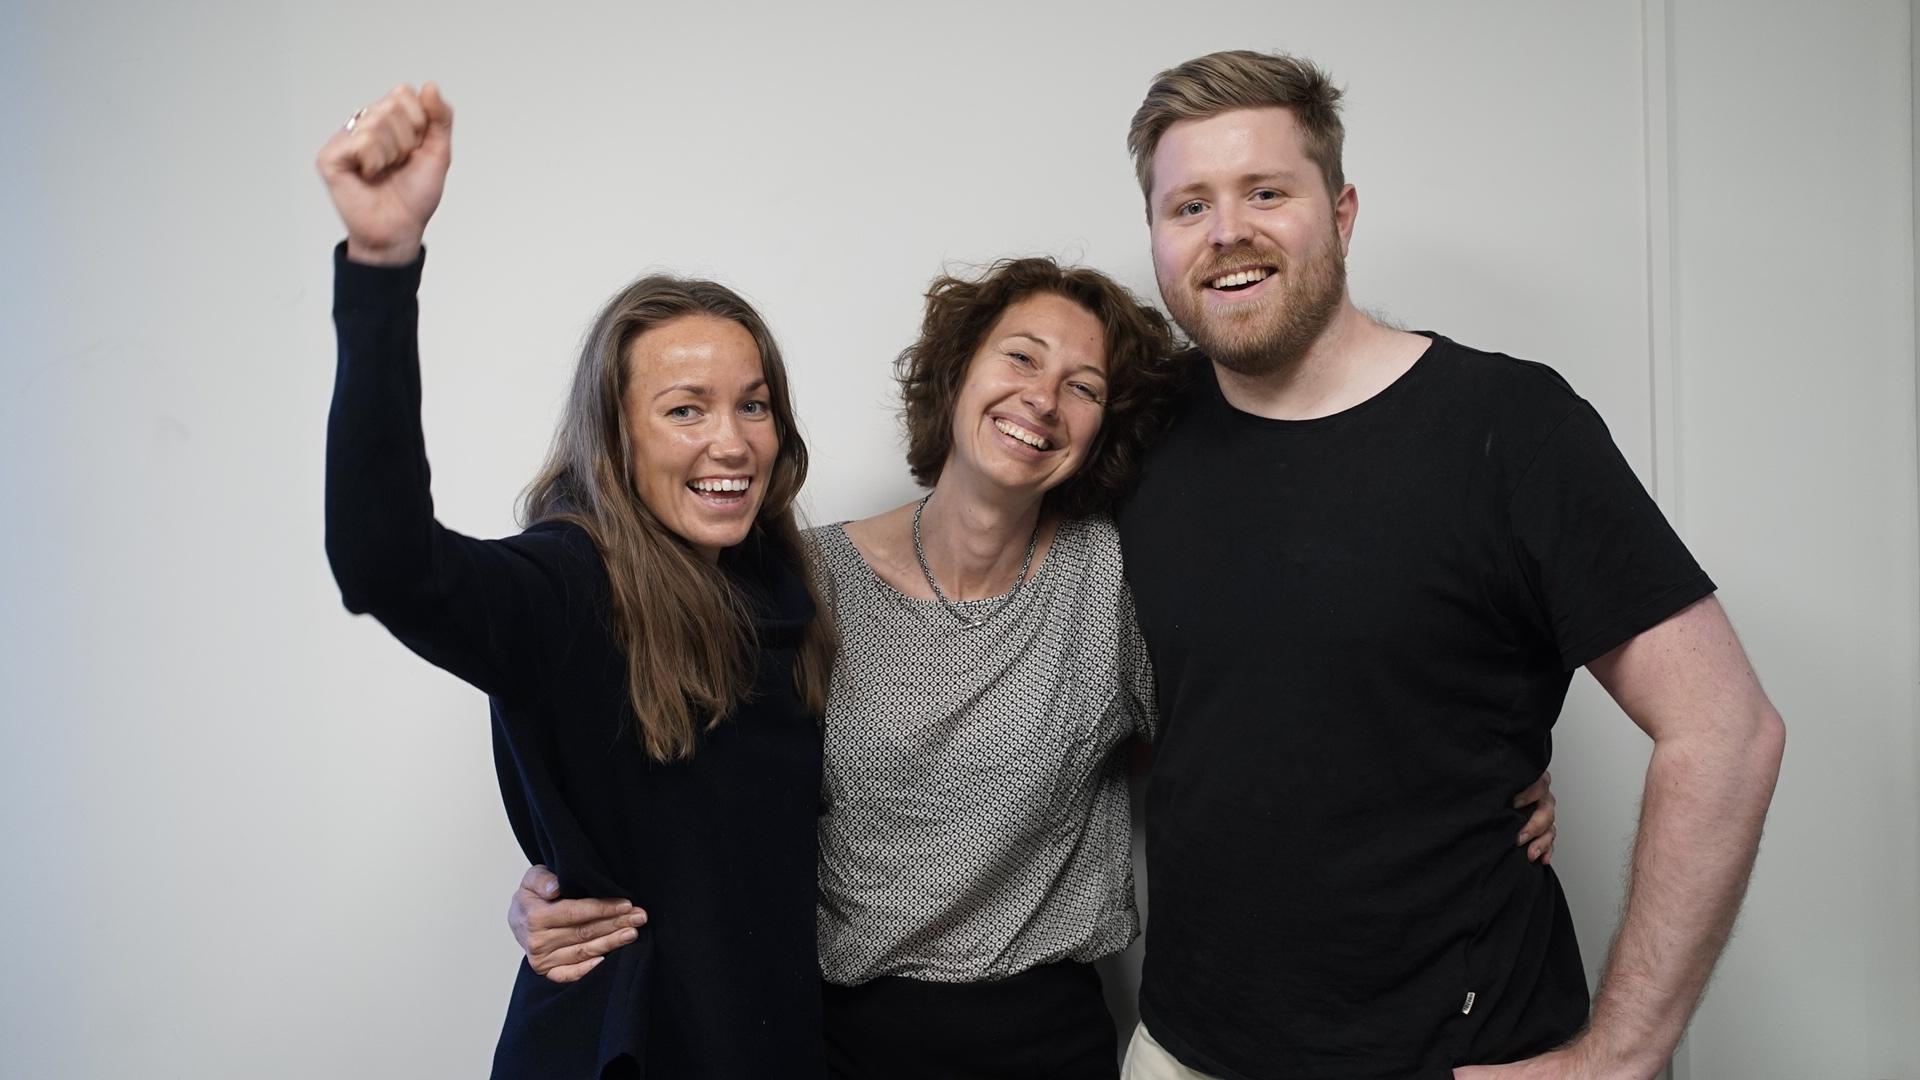 Gjengen bak podkasten 'De som bygger det nye Norge.' F.v.: Kristine Masdal Aadne (OBF), Silvija Seres, Lars Erik Fjøsne (OBF). Foto: Oslo Business Forum